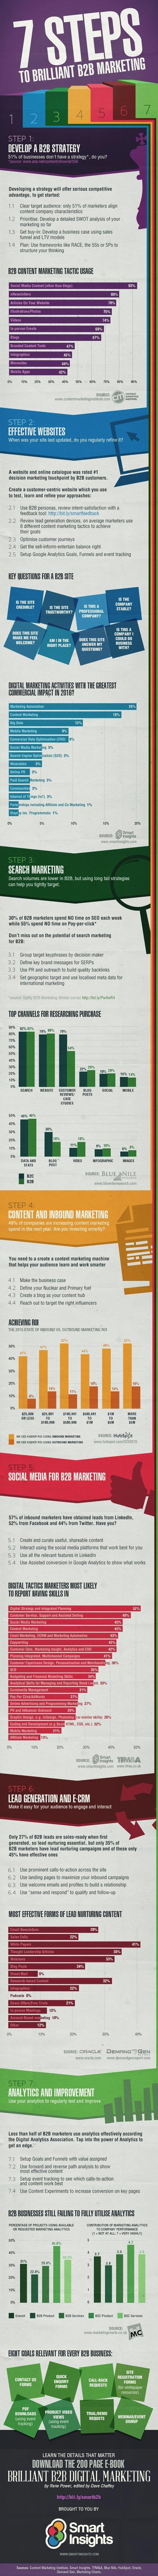 B2B Infographic of the week: 7 steps to brilliant B2B marketing